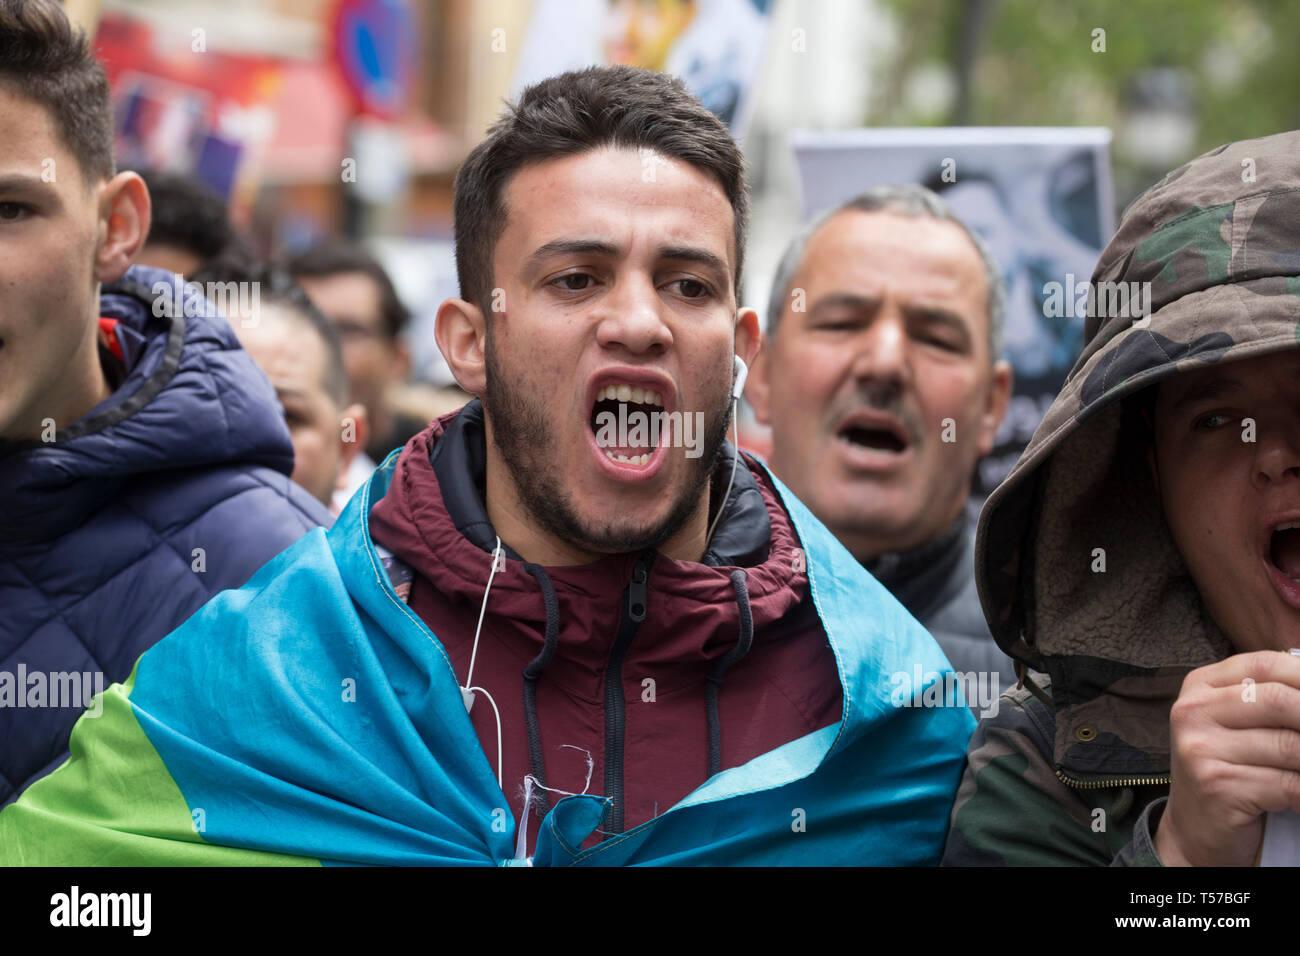 Madrid, Spain  21st Apr, 2019  Demonstrator seen wrapped in